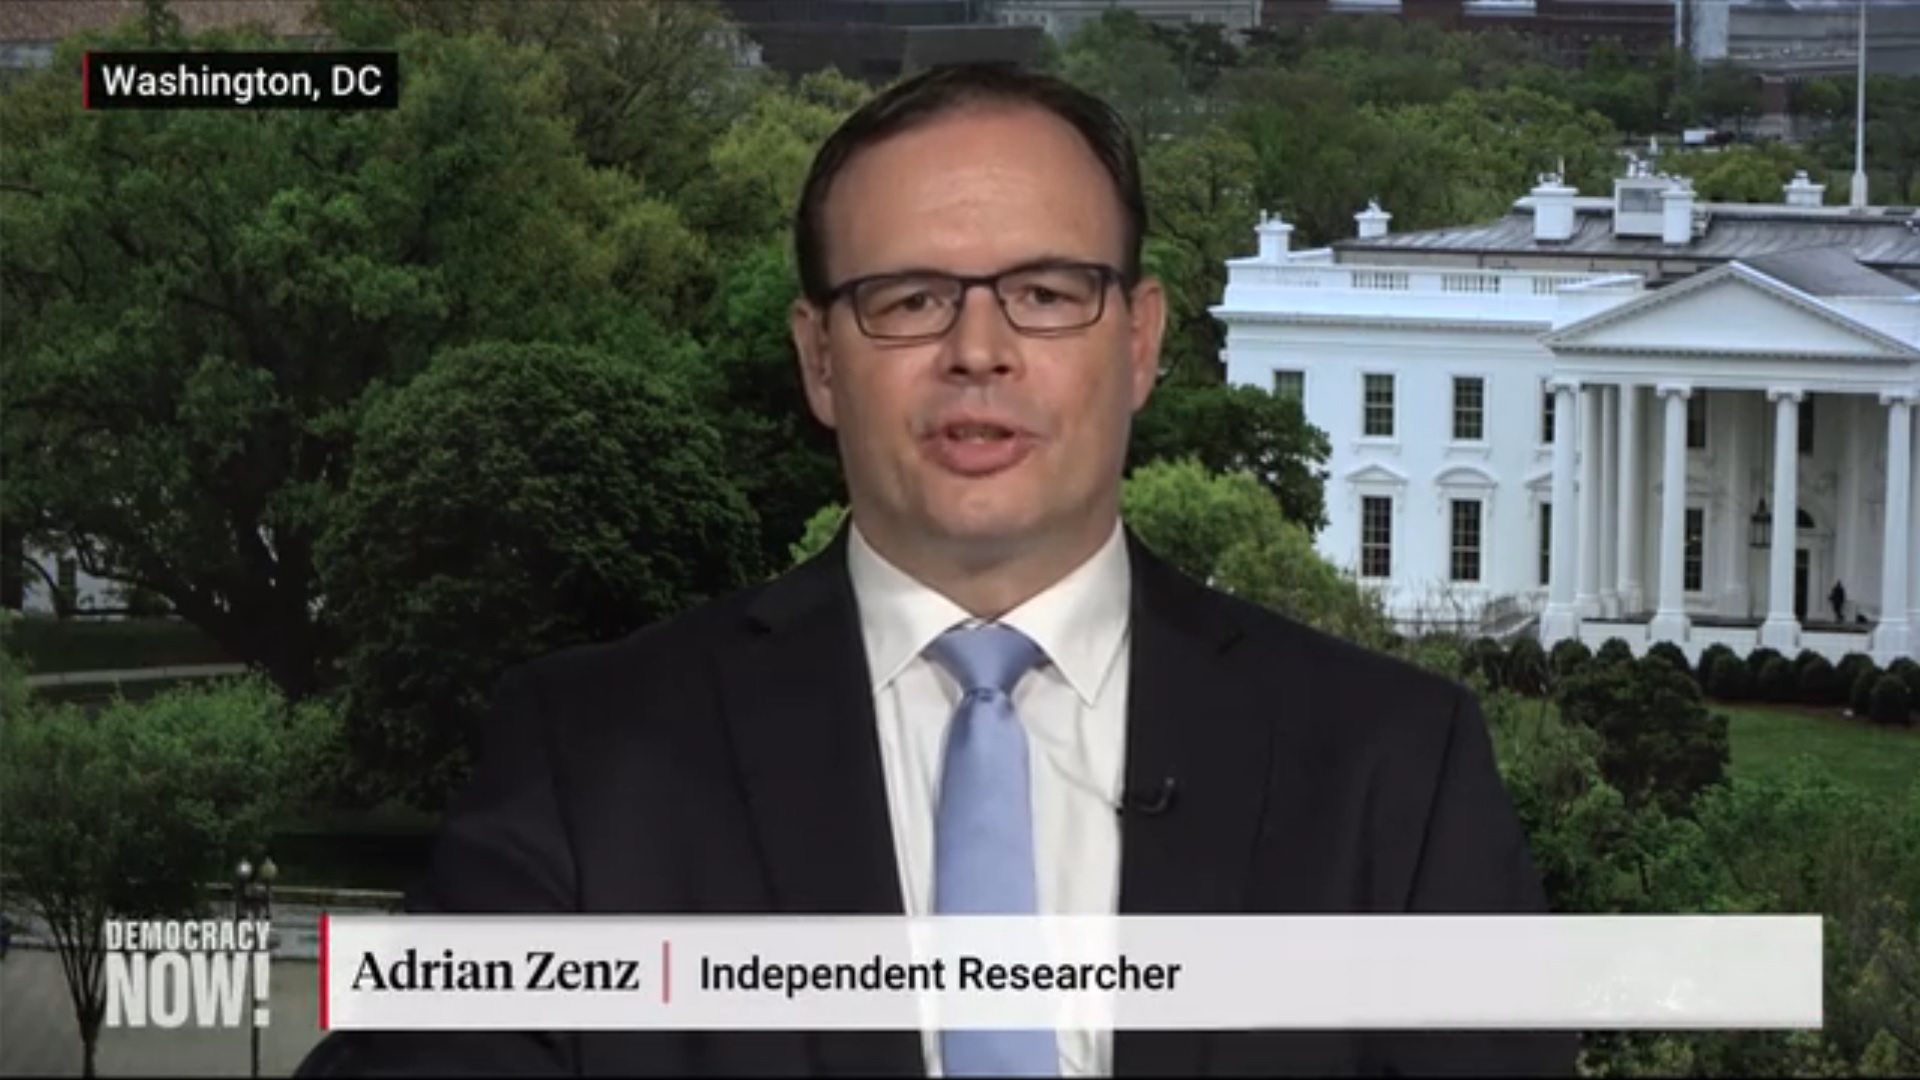 Adrian Zenz Uyghurs China Christian fundamentalist